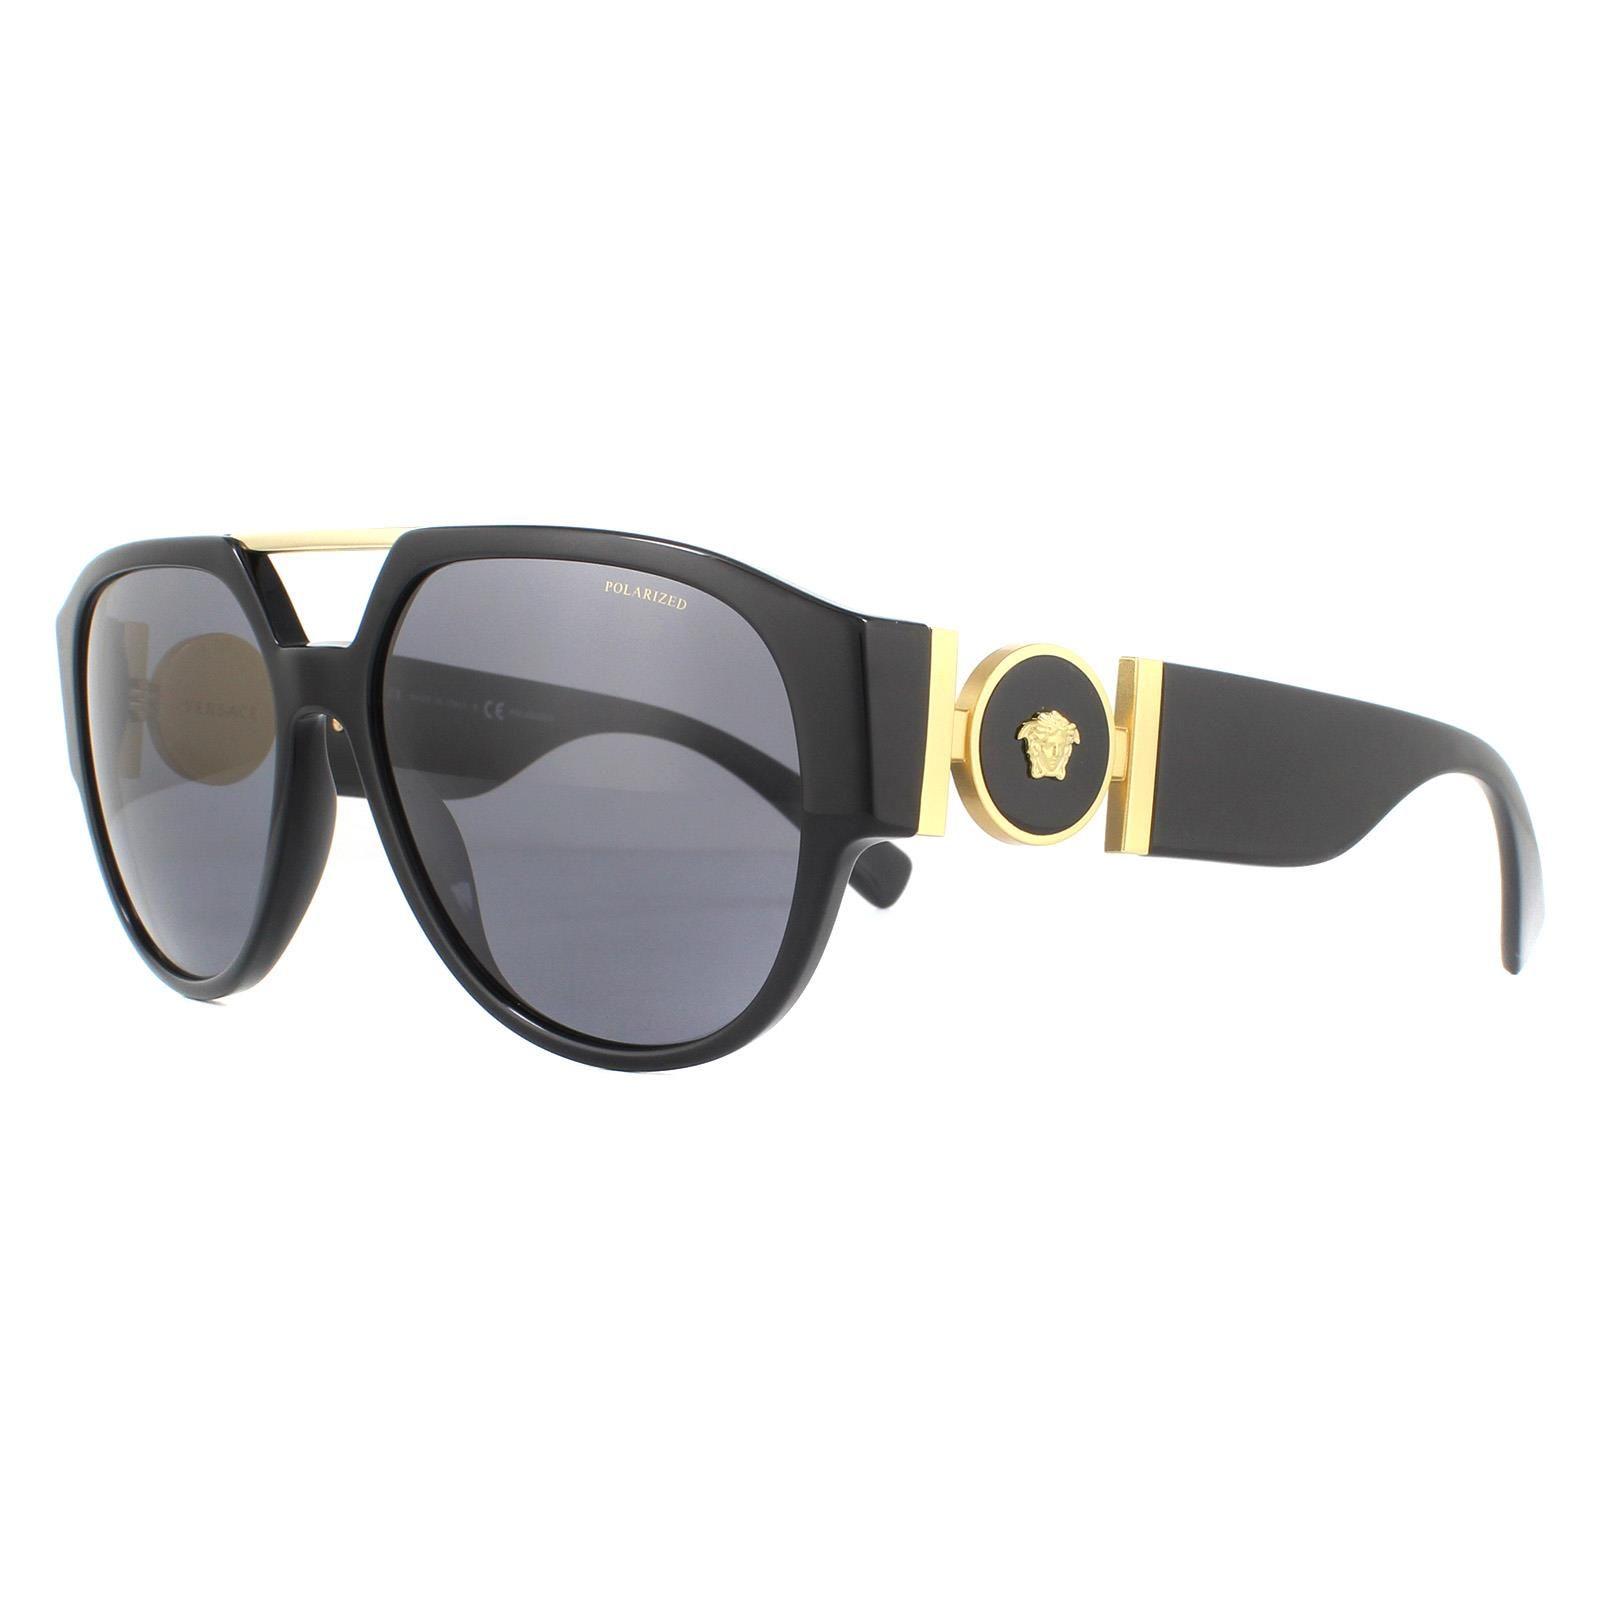 Versace Sunglasses VE4371 GB1/81 Black Dark Grey Polarized